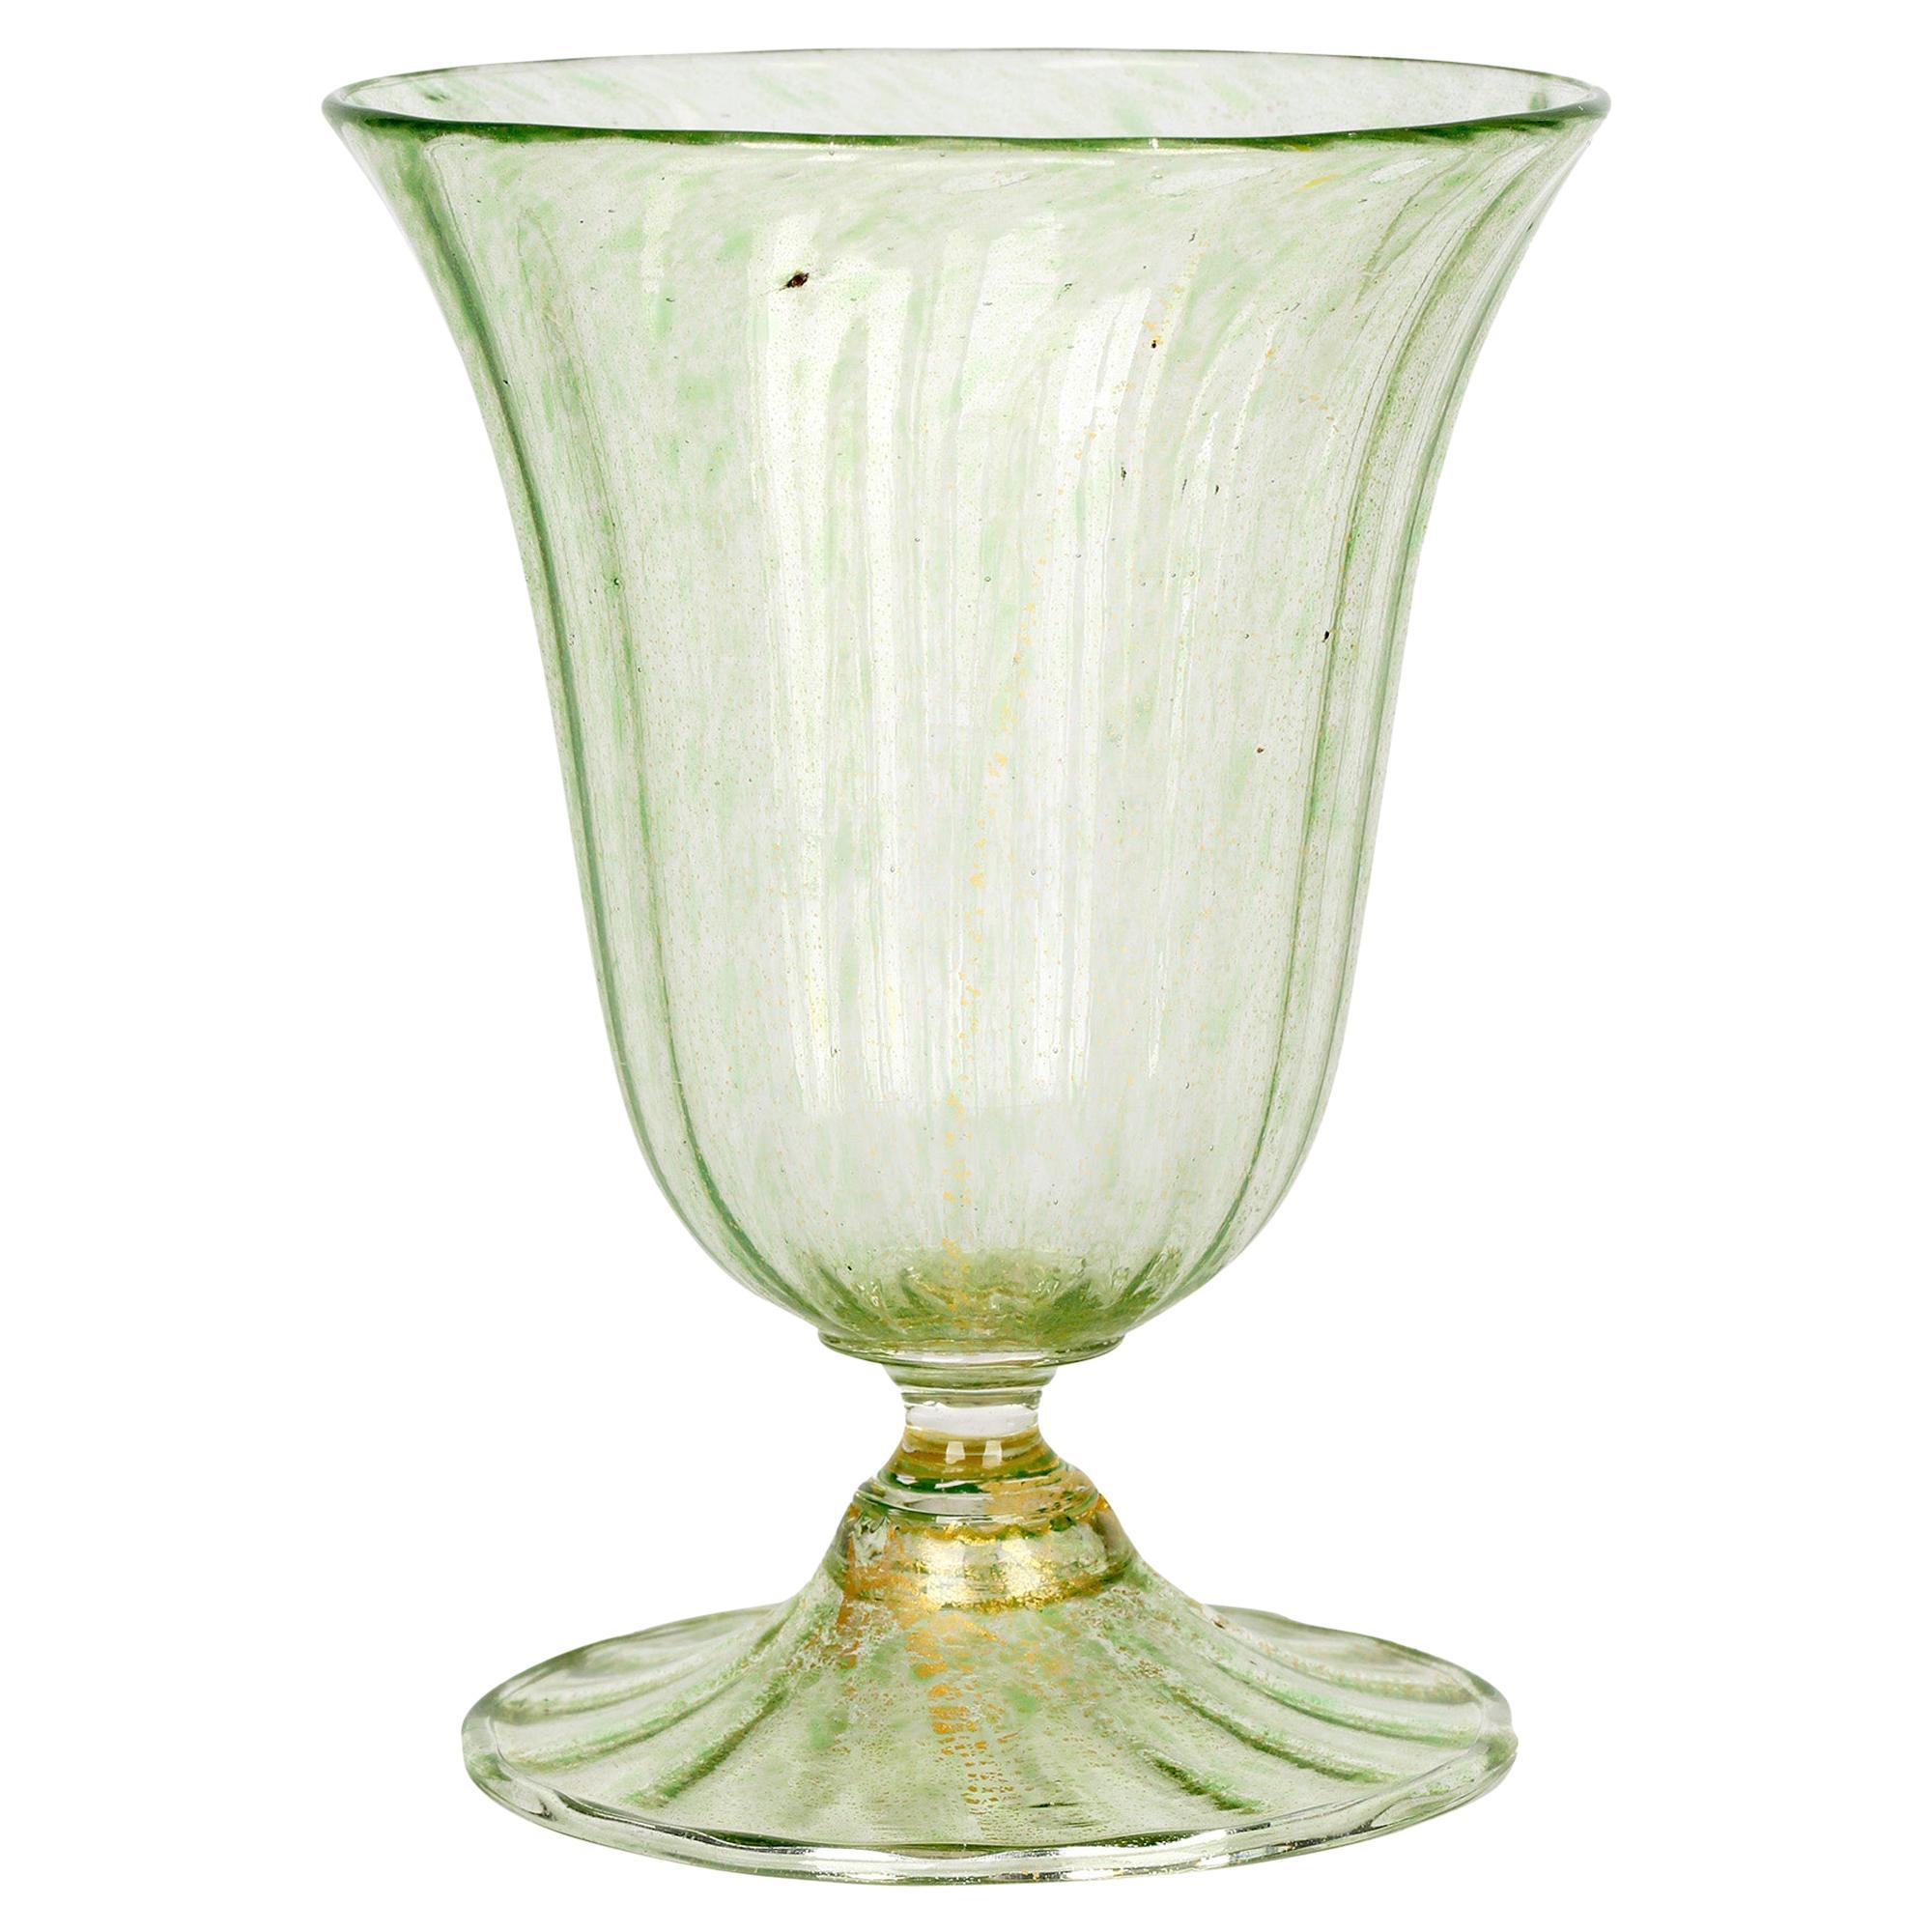 Antonio Salviati Venetian Revival Green and Aventurine Sundae or Ice Cream Glass